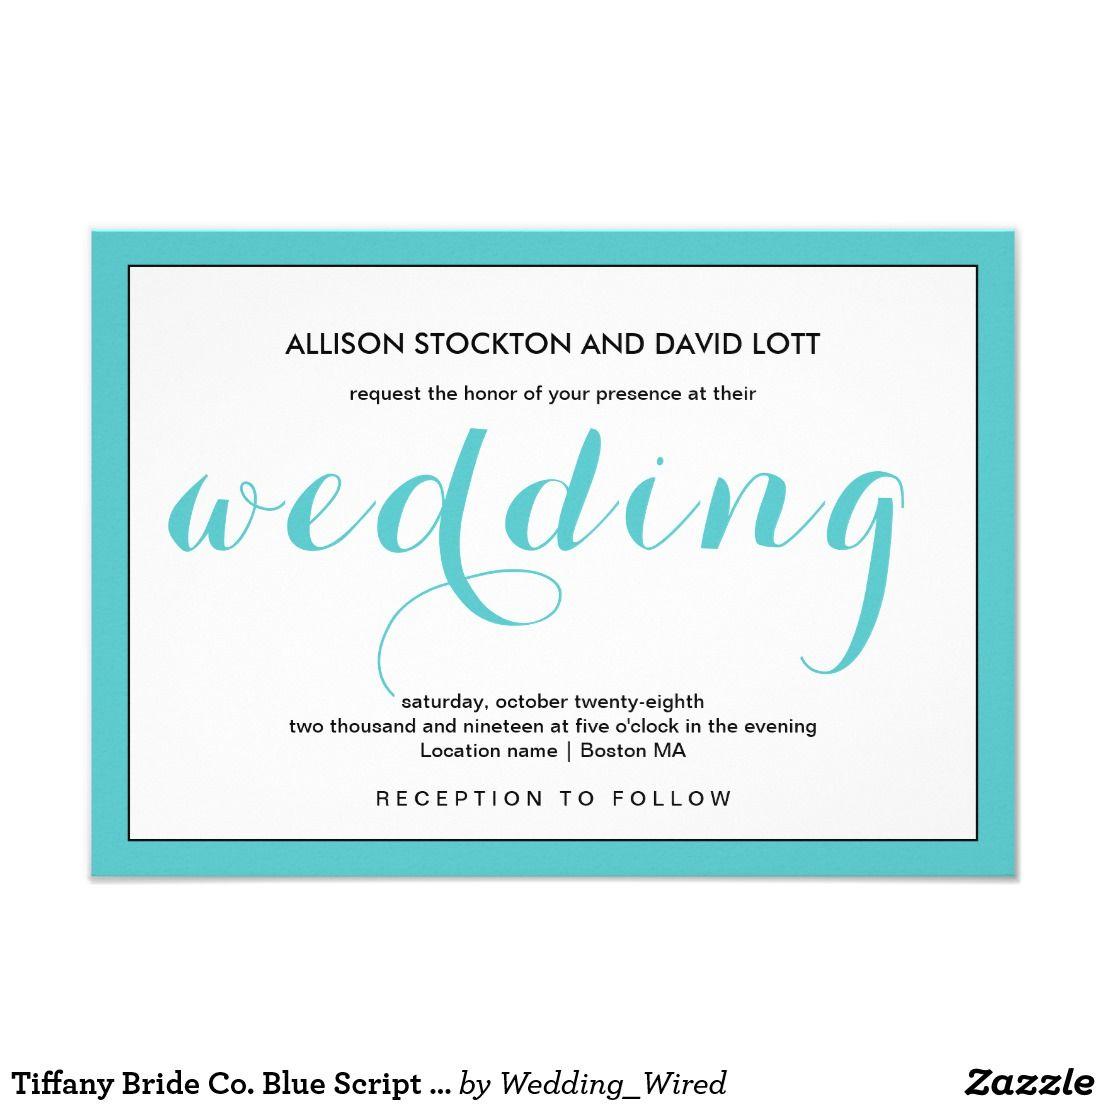 Bride Co Tiffany Blue Script Wedding Invitation